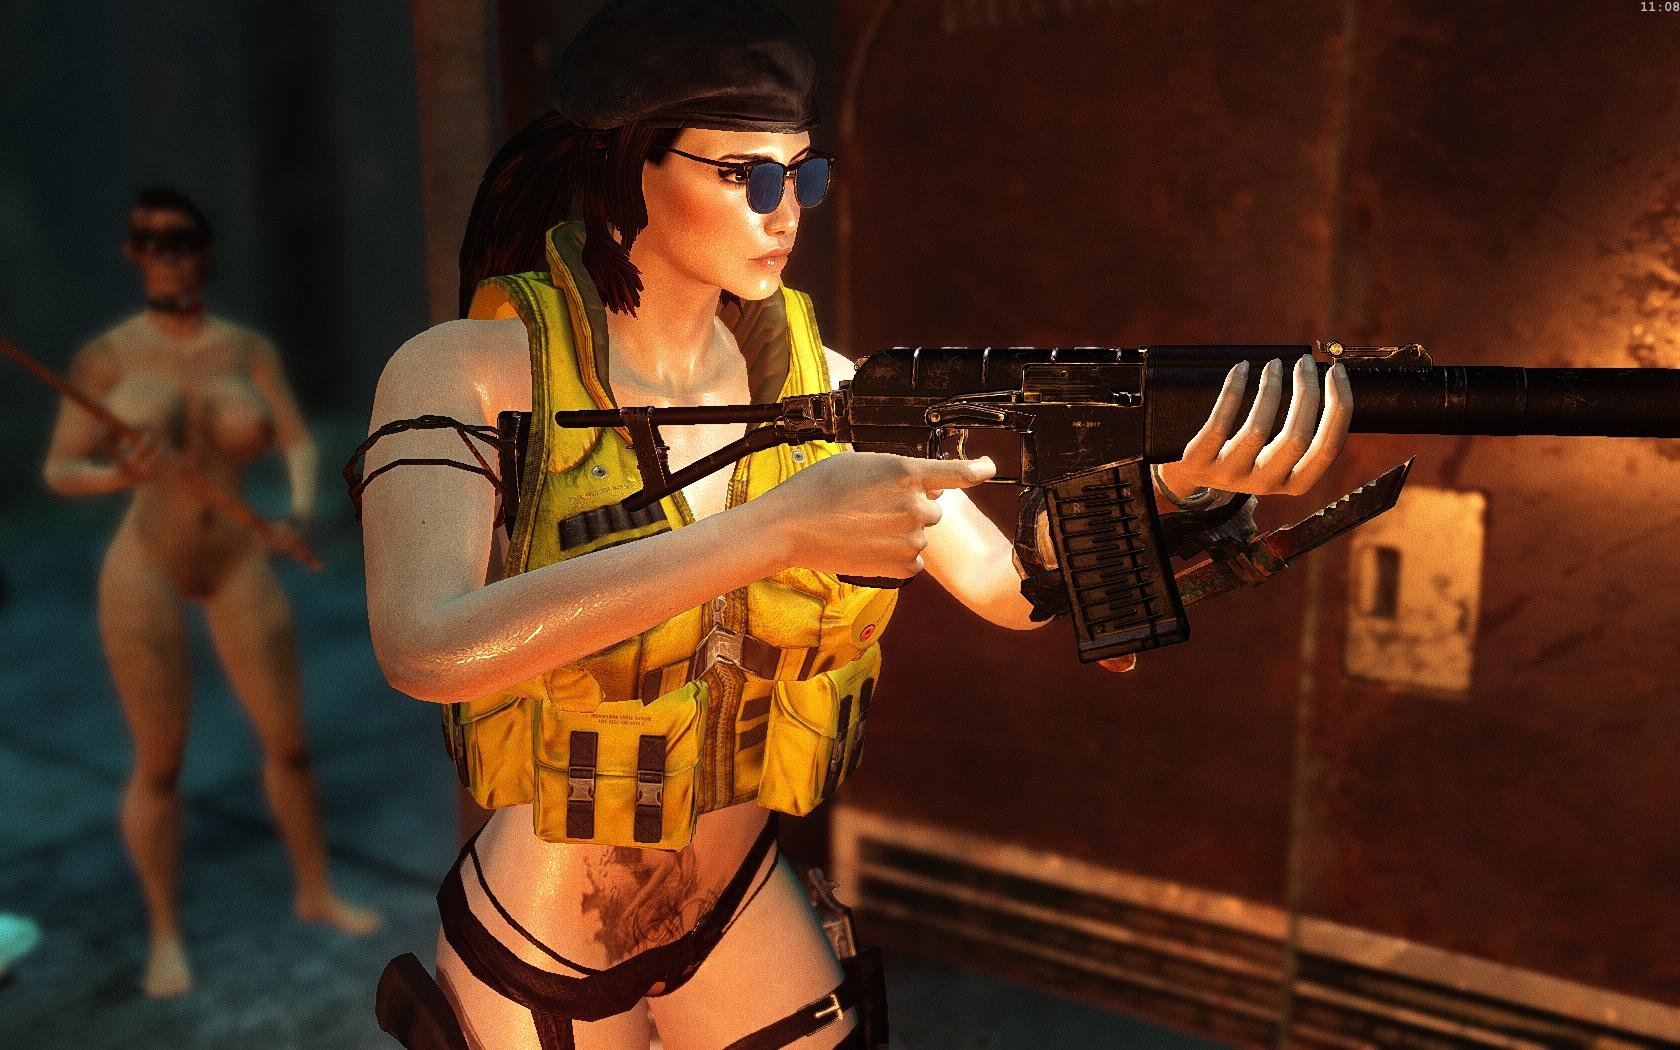 Fallout4 2019-03-25 11-08-21-85